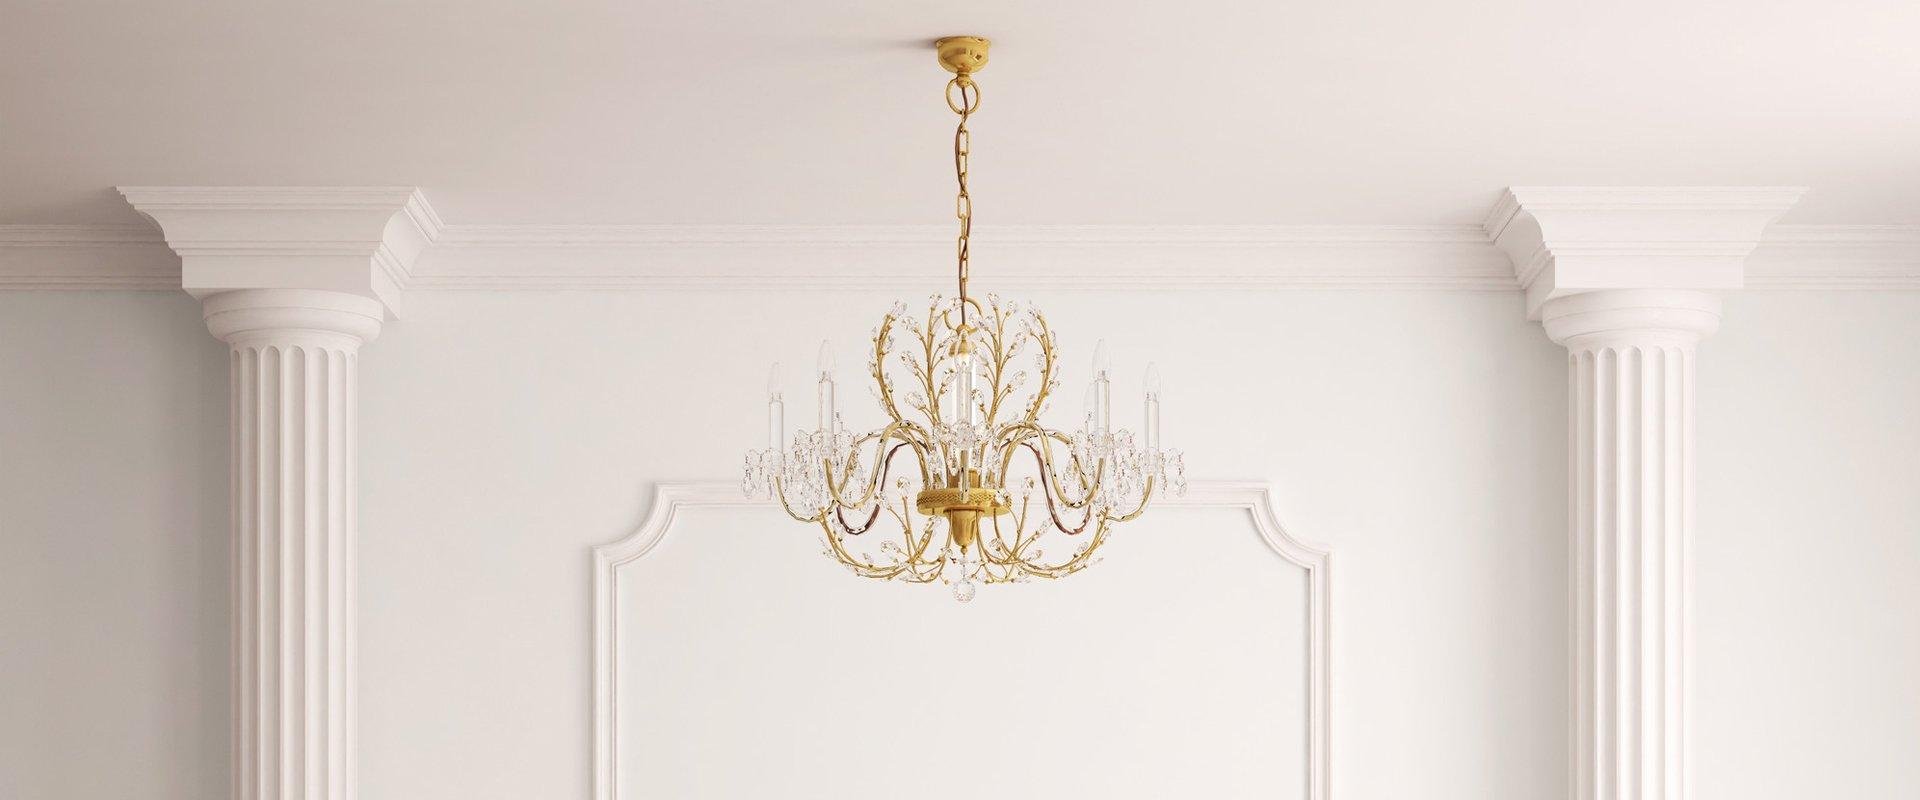 ceiling centrepiece